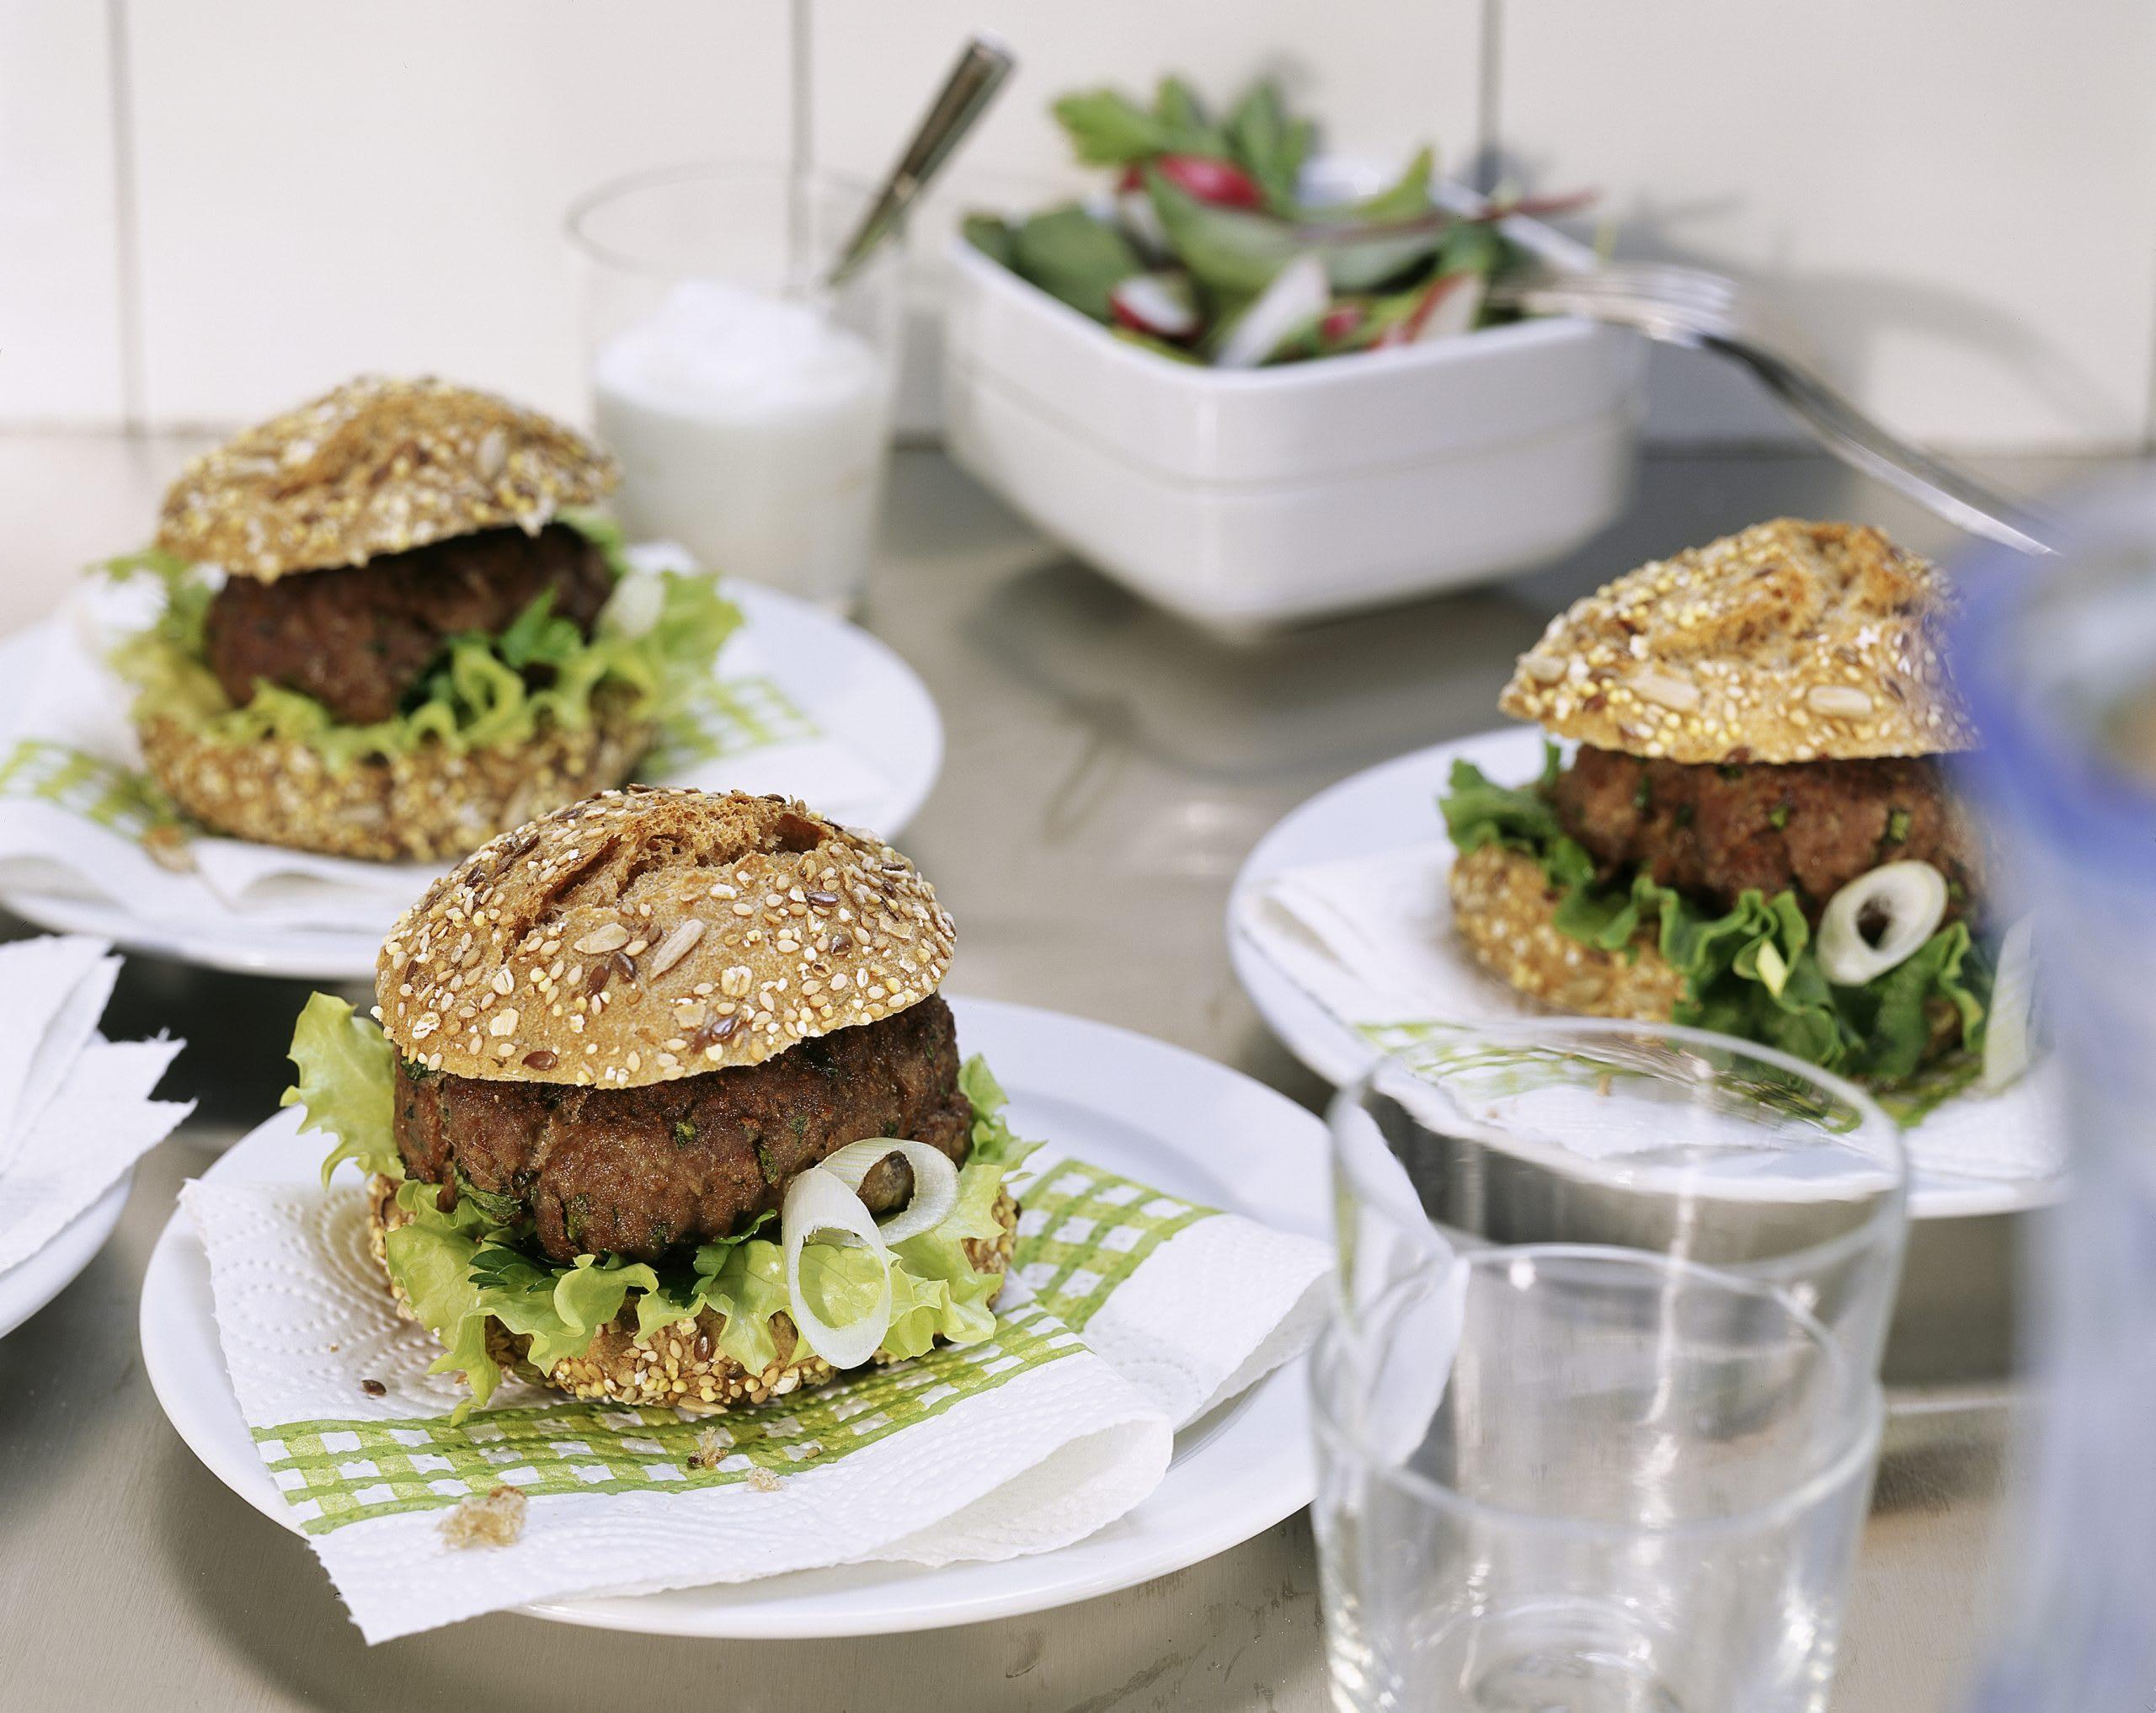 Würzige Hamburger mit Joghurtsauce